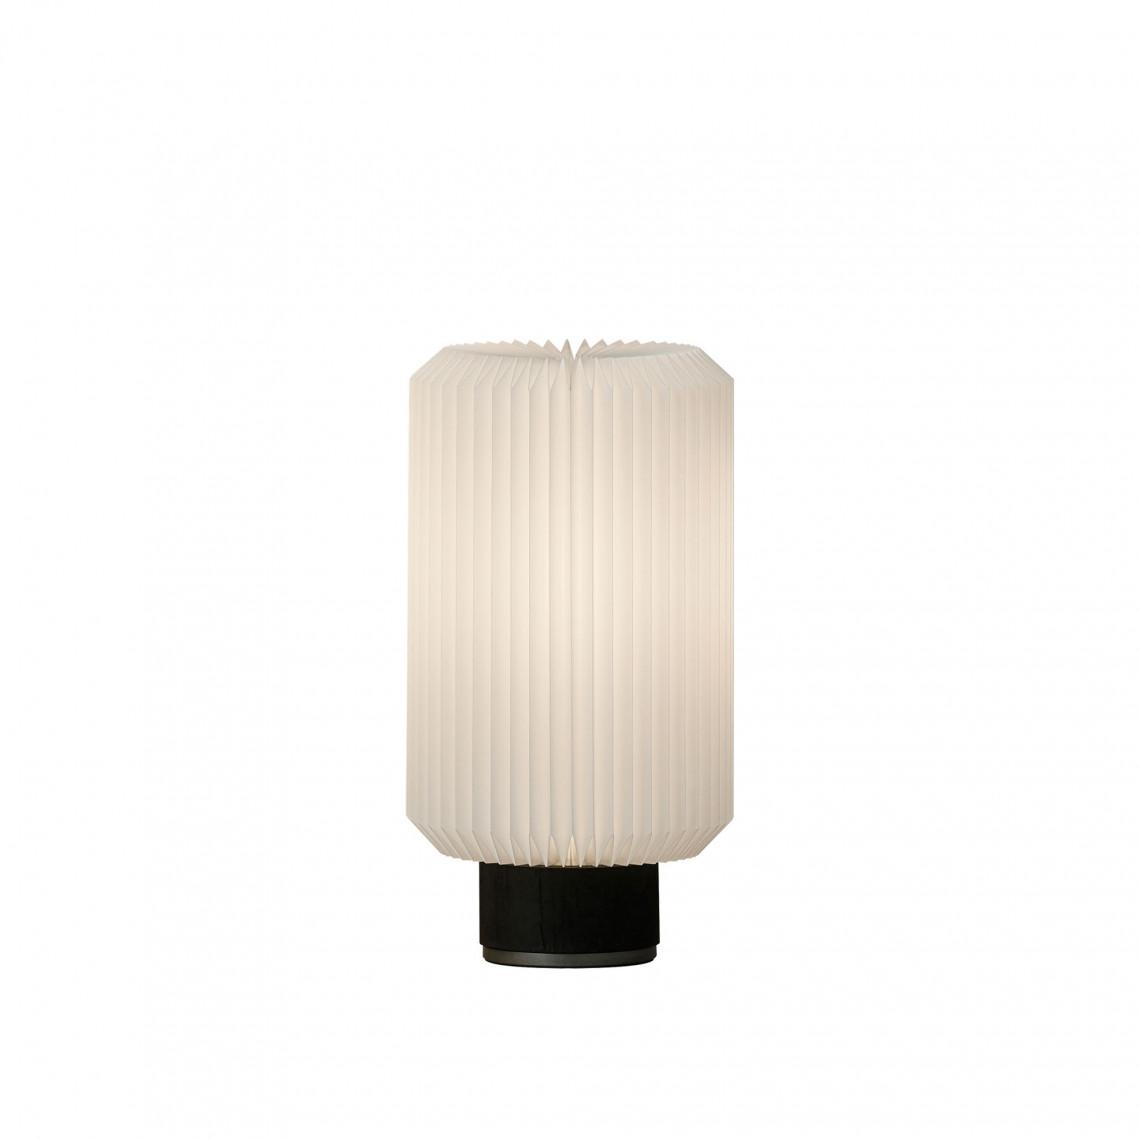 Cylinder Bordslampa